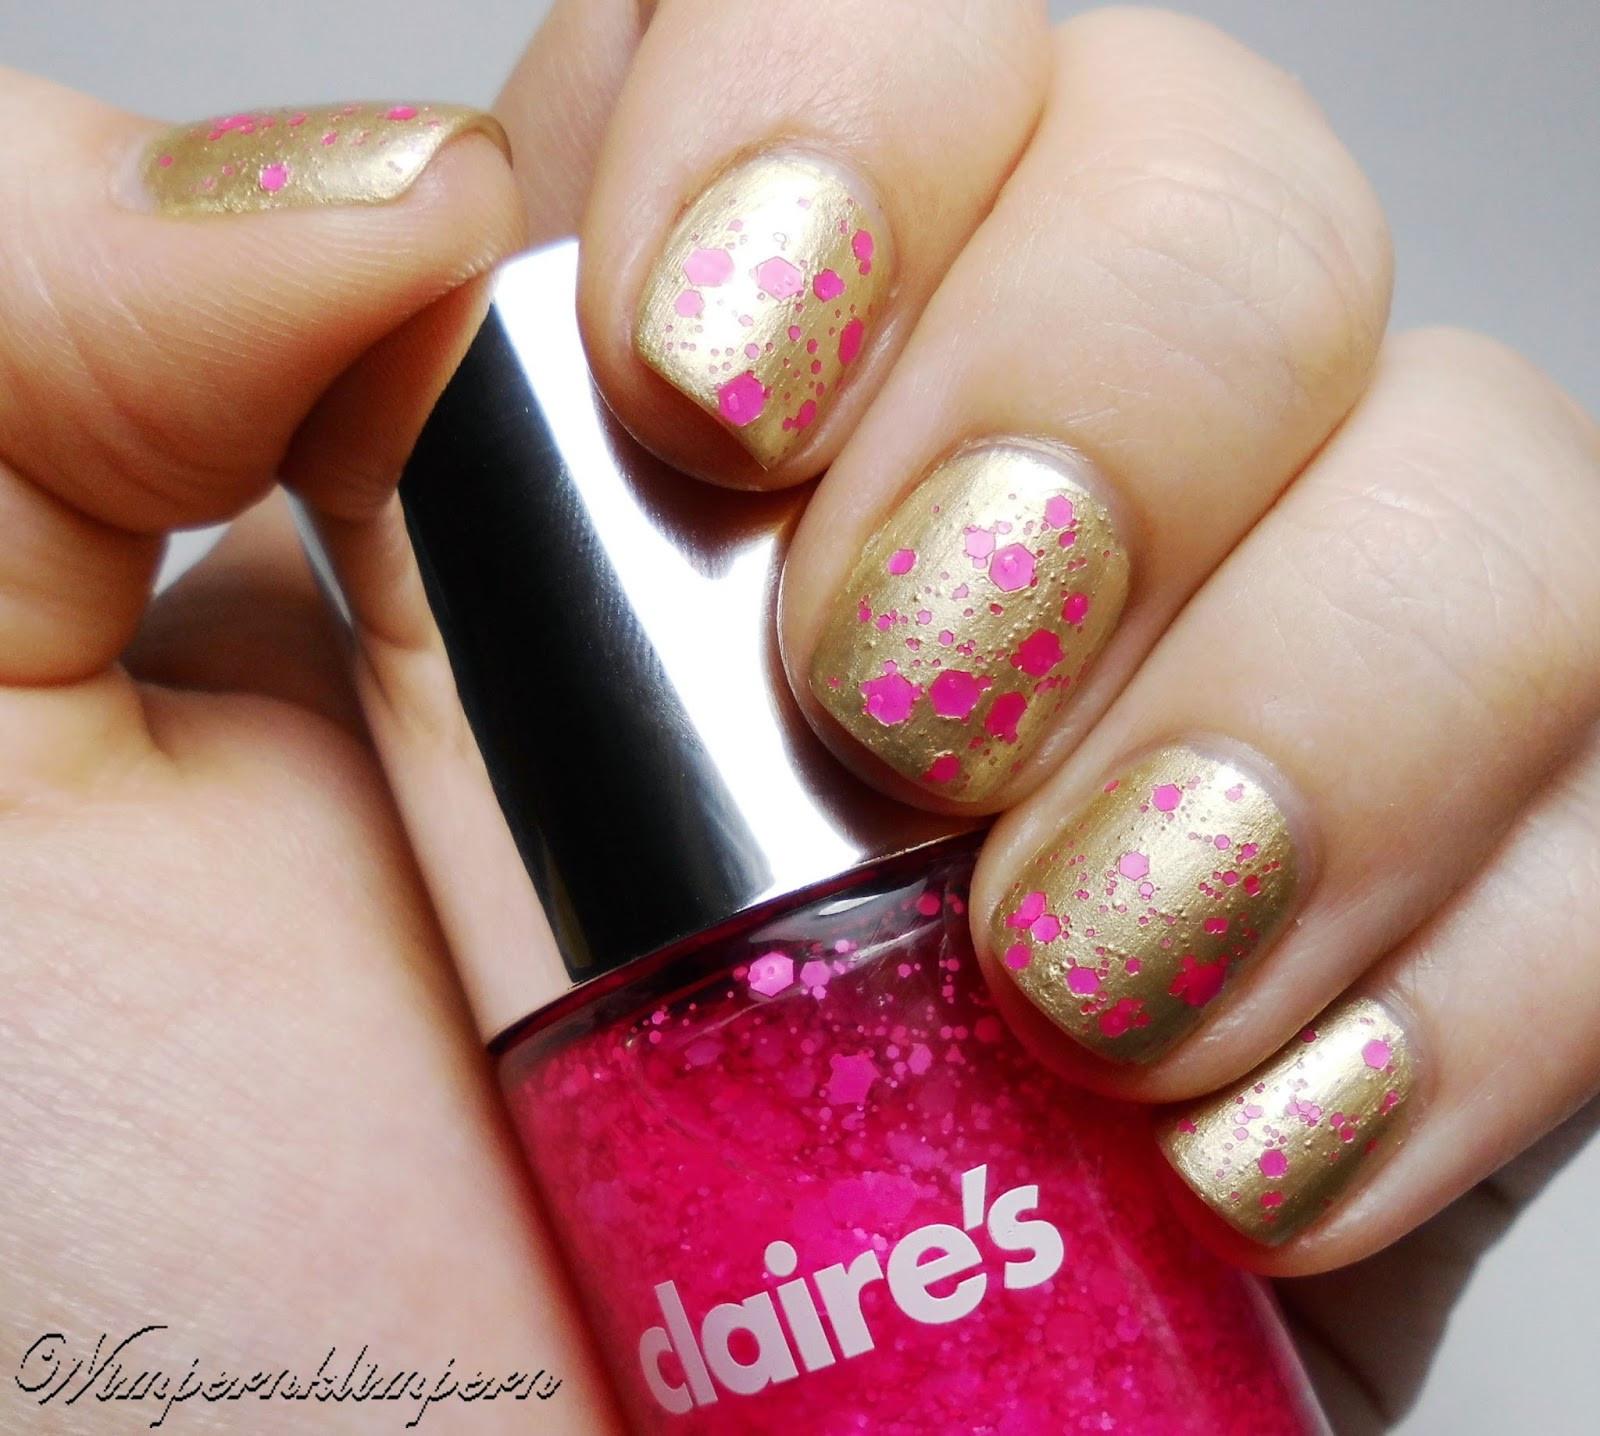 Nageldesign Komplett Lackiert  Wimpernklimpern Nageldesign Gold & Pink